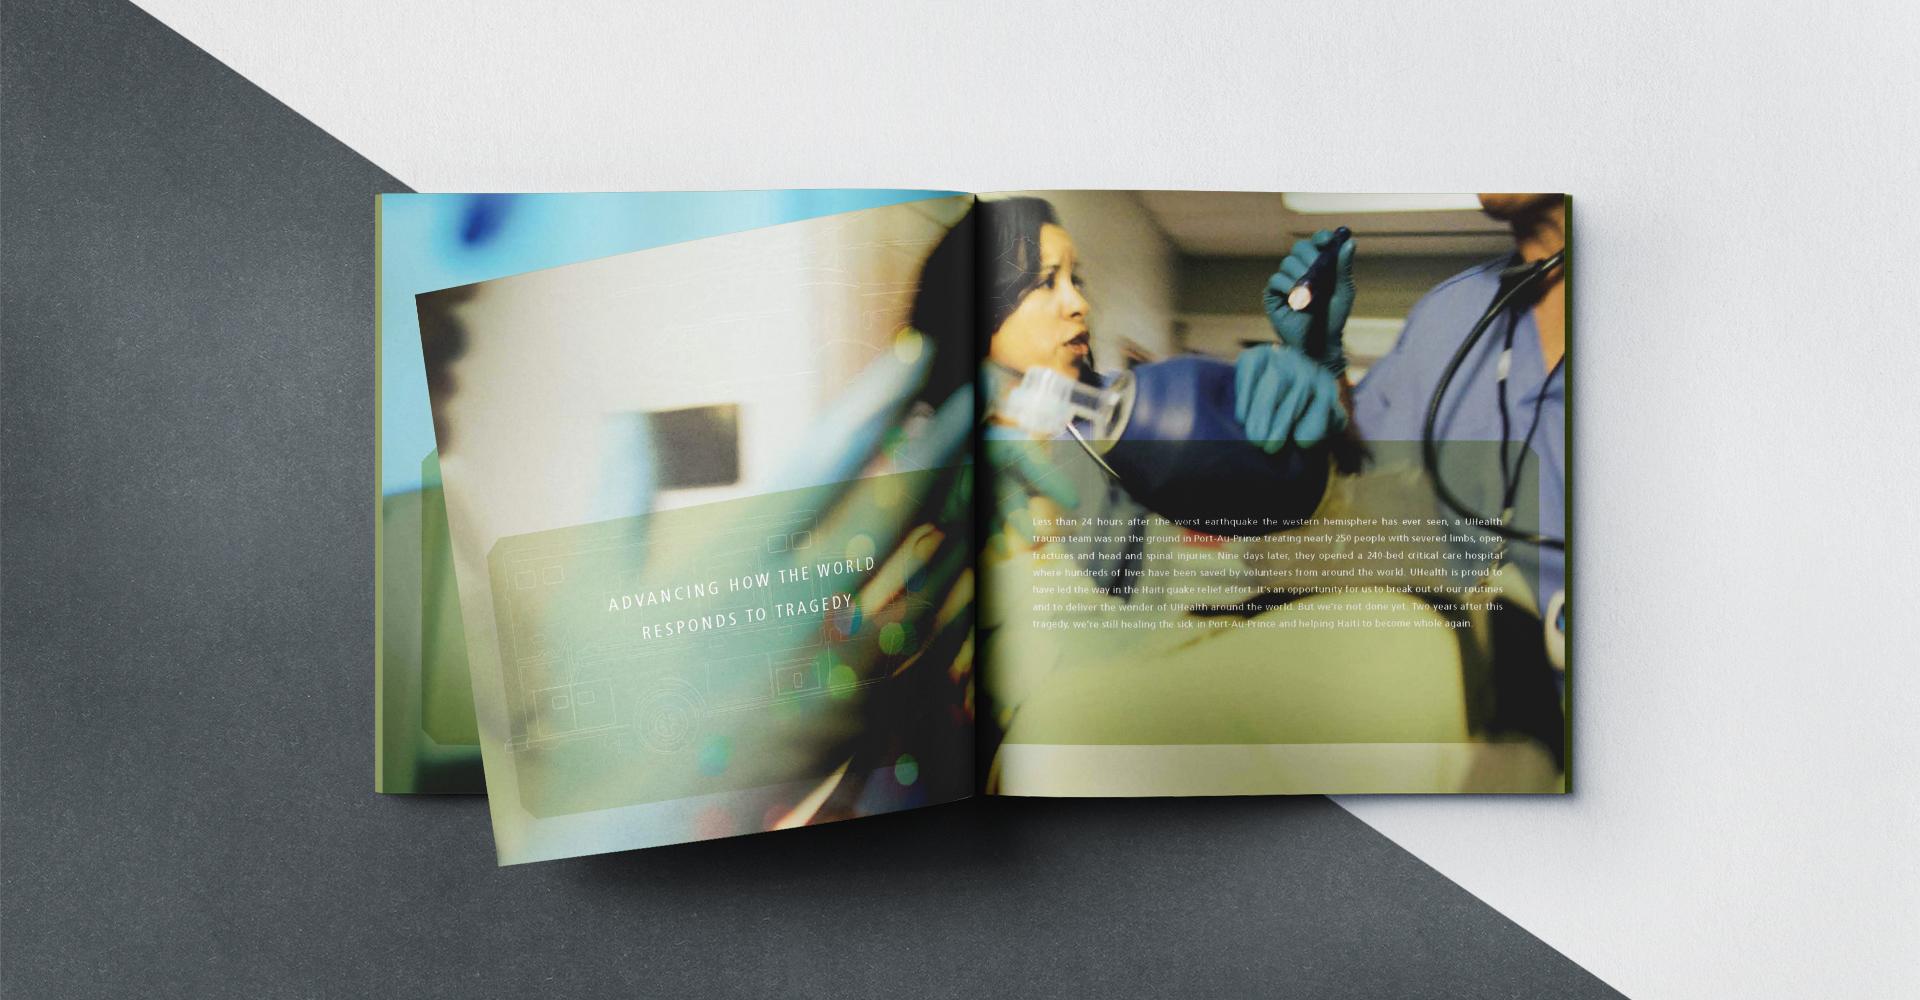 UHealth booklet